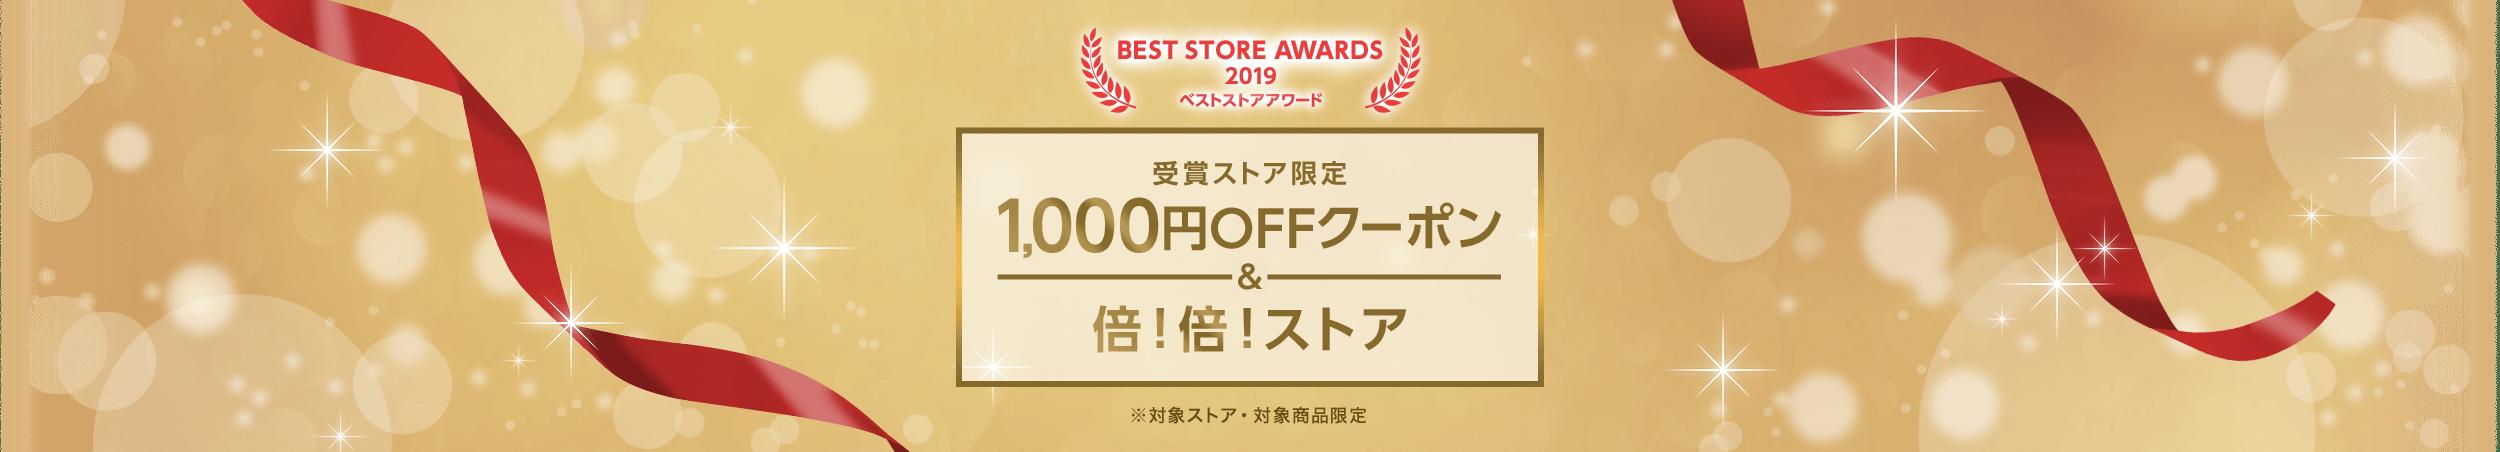 BEST STORE AWARD 2019 受賞ストア1,000円OFFクーポン 倍!倍!ストア